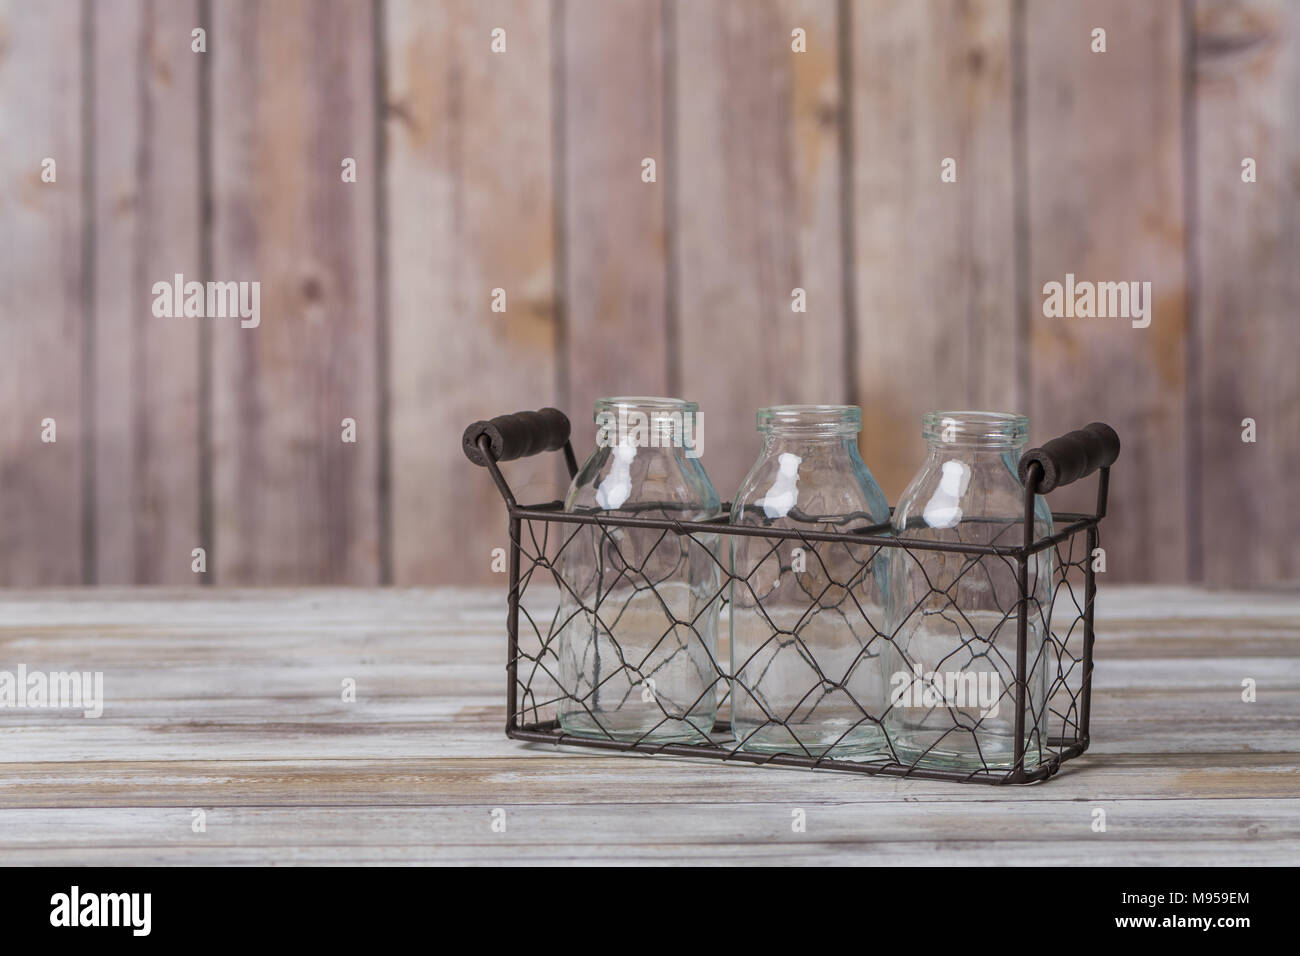 Vintage milk bottles in a wire basket carrier Stock Photo: 177752812 ...